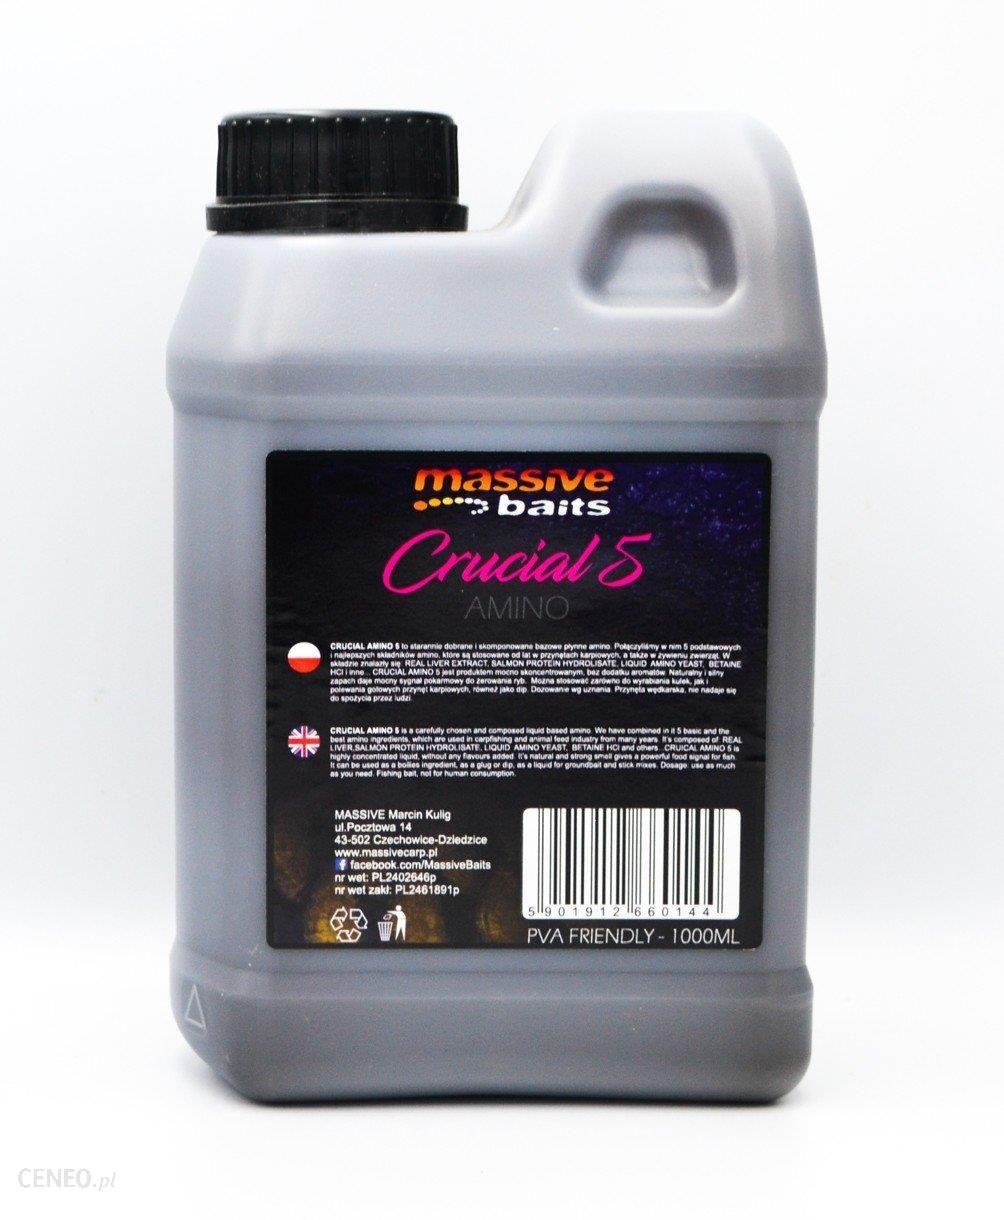 Massive Baits Crucial Amino 5 Liquid